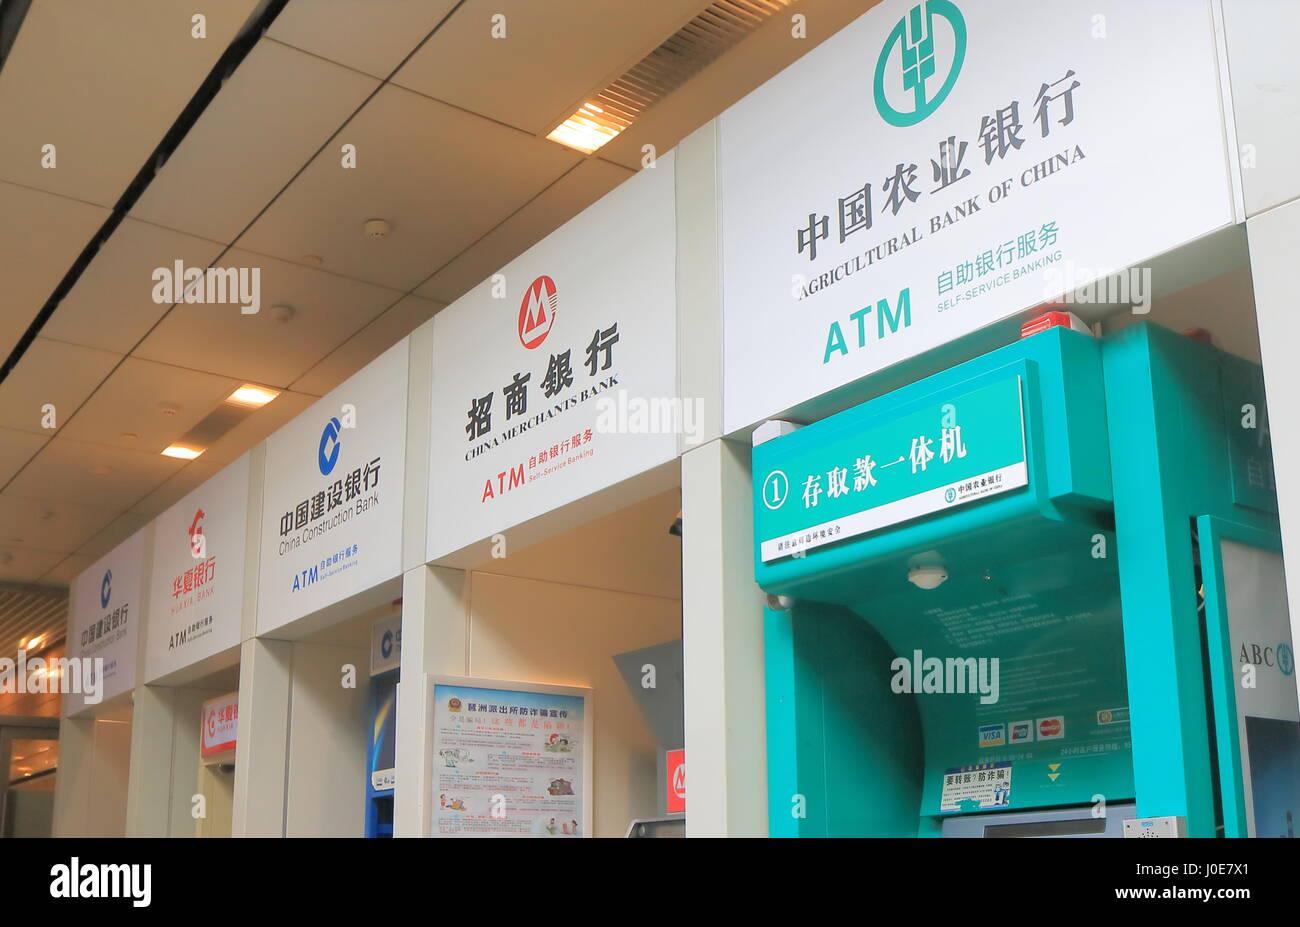 Chinese bank ATM cash machine in Guangzhou China. - Stock Image